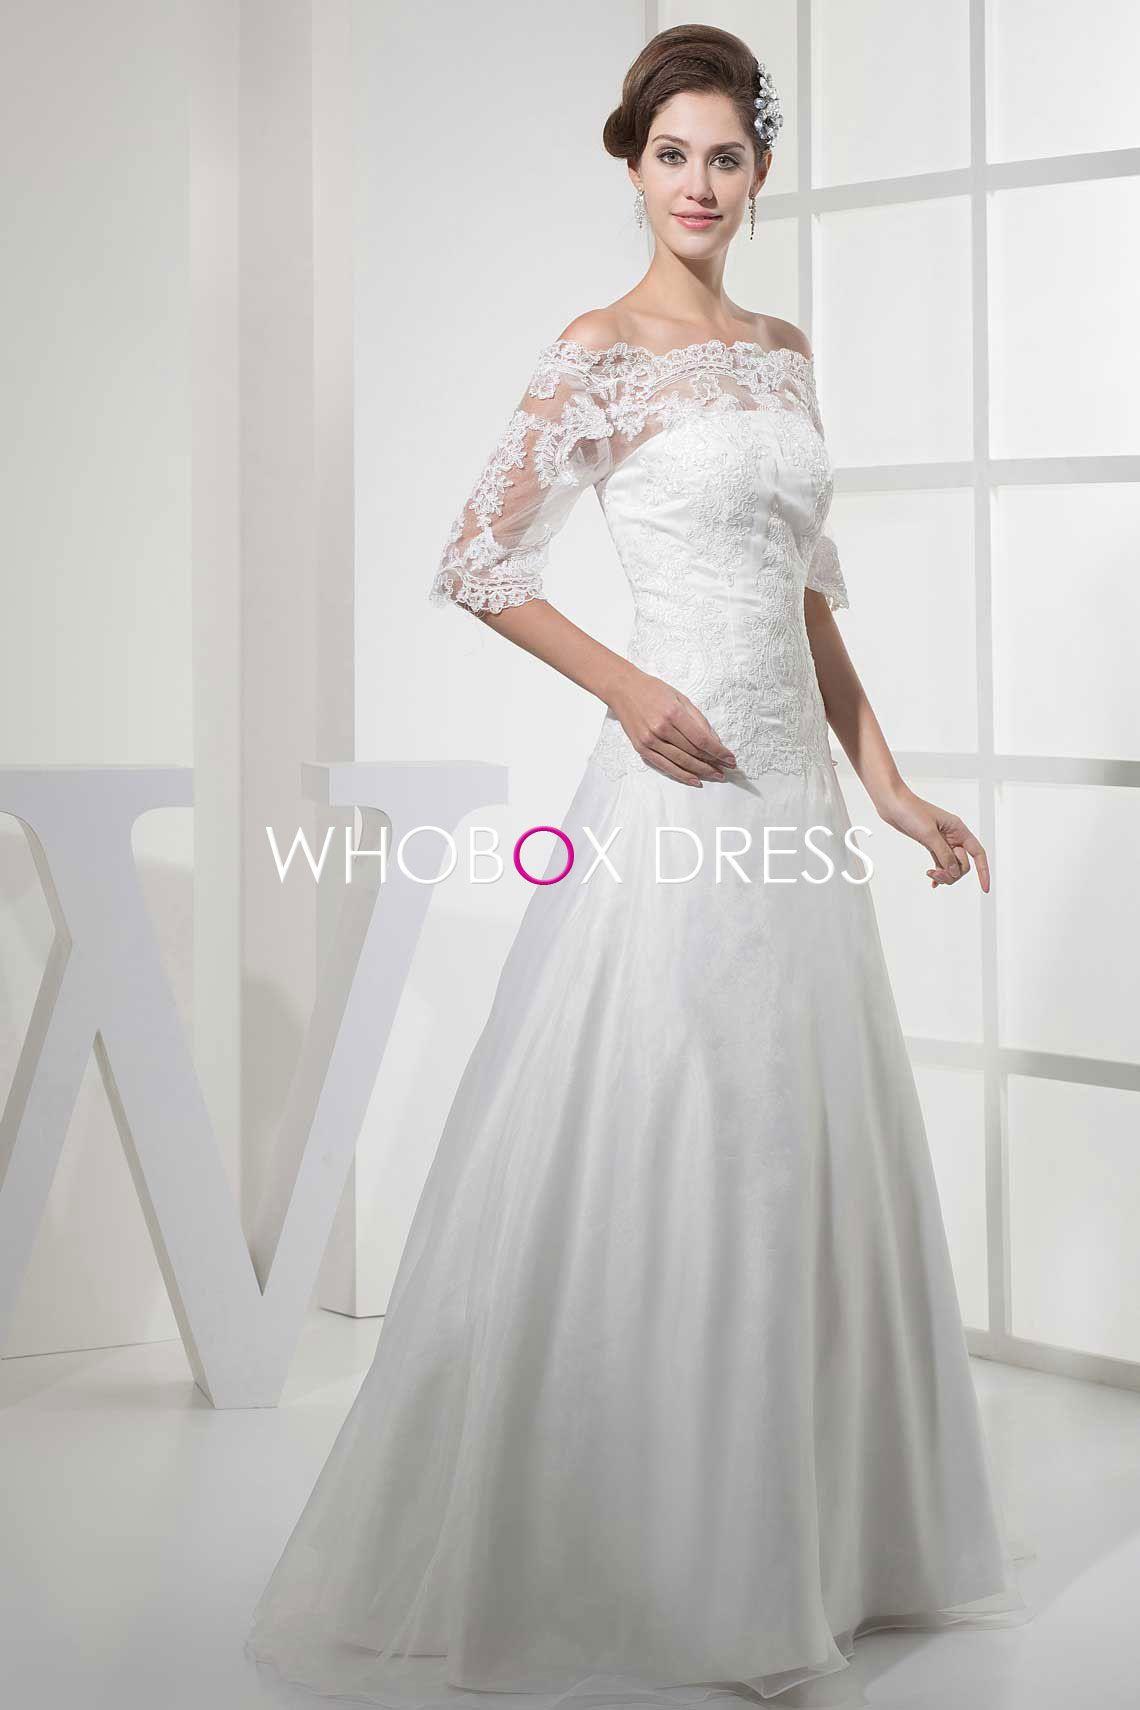 Organza long beaded tulle natural waist half sleeve aline wedding